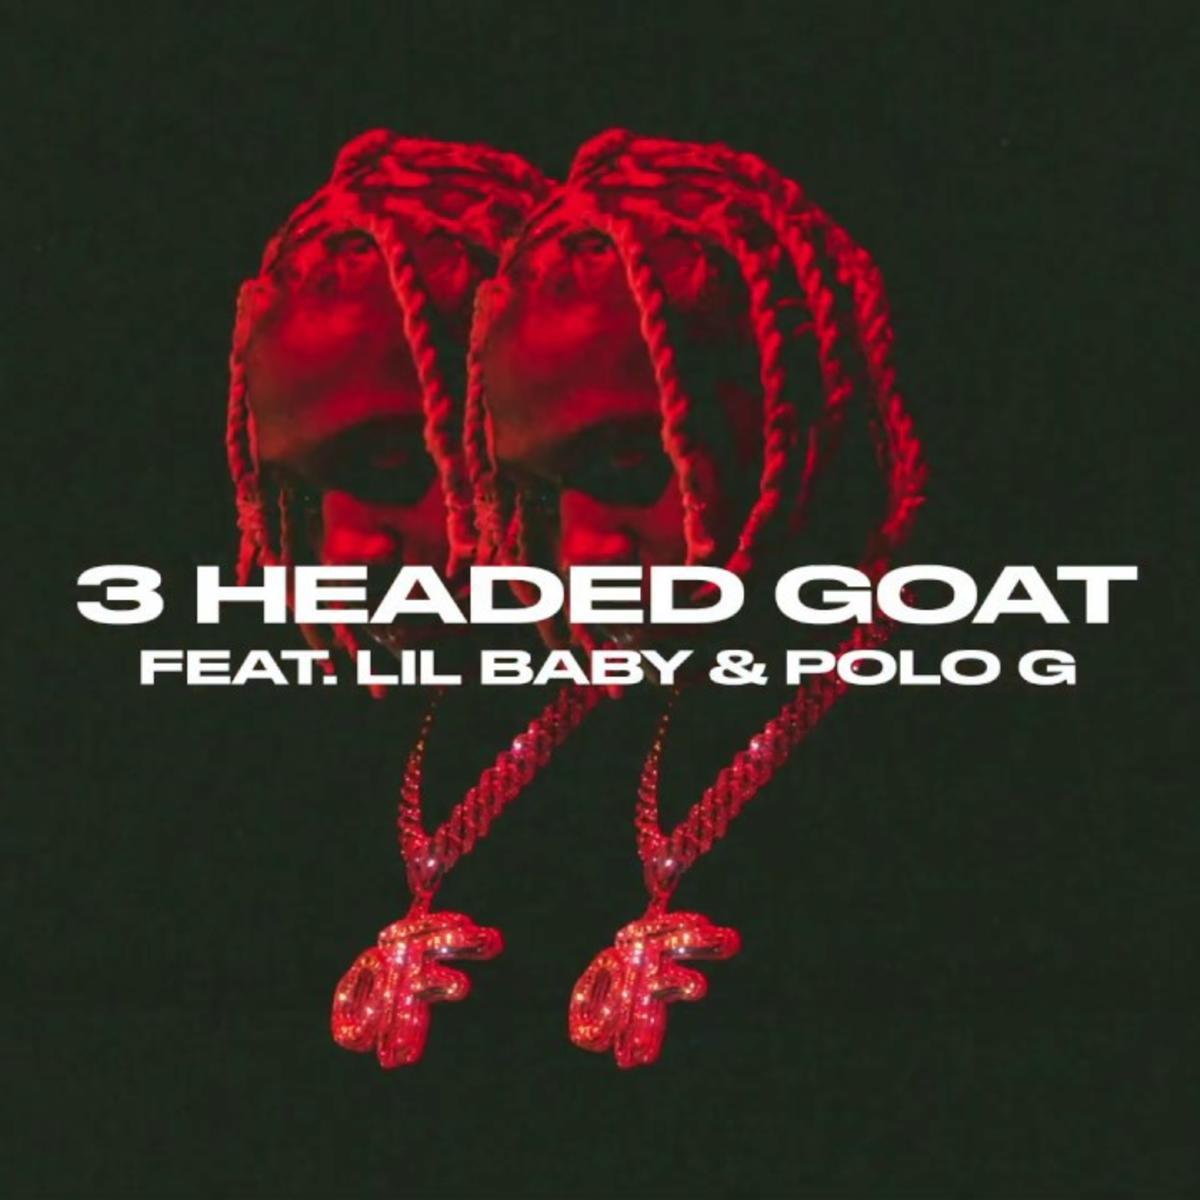 Lil Dirk 3 headed Goat